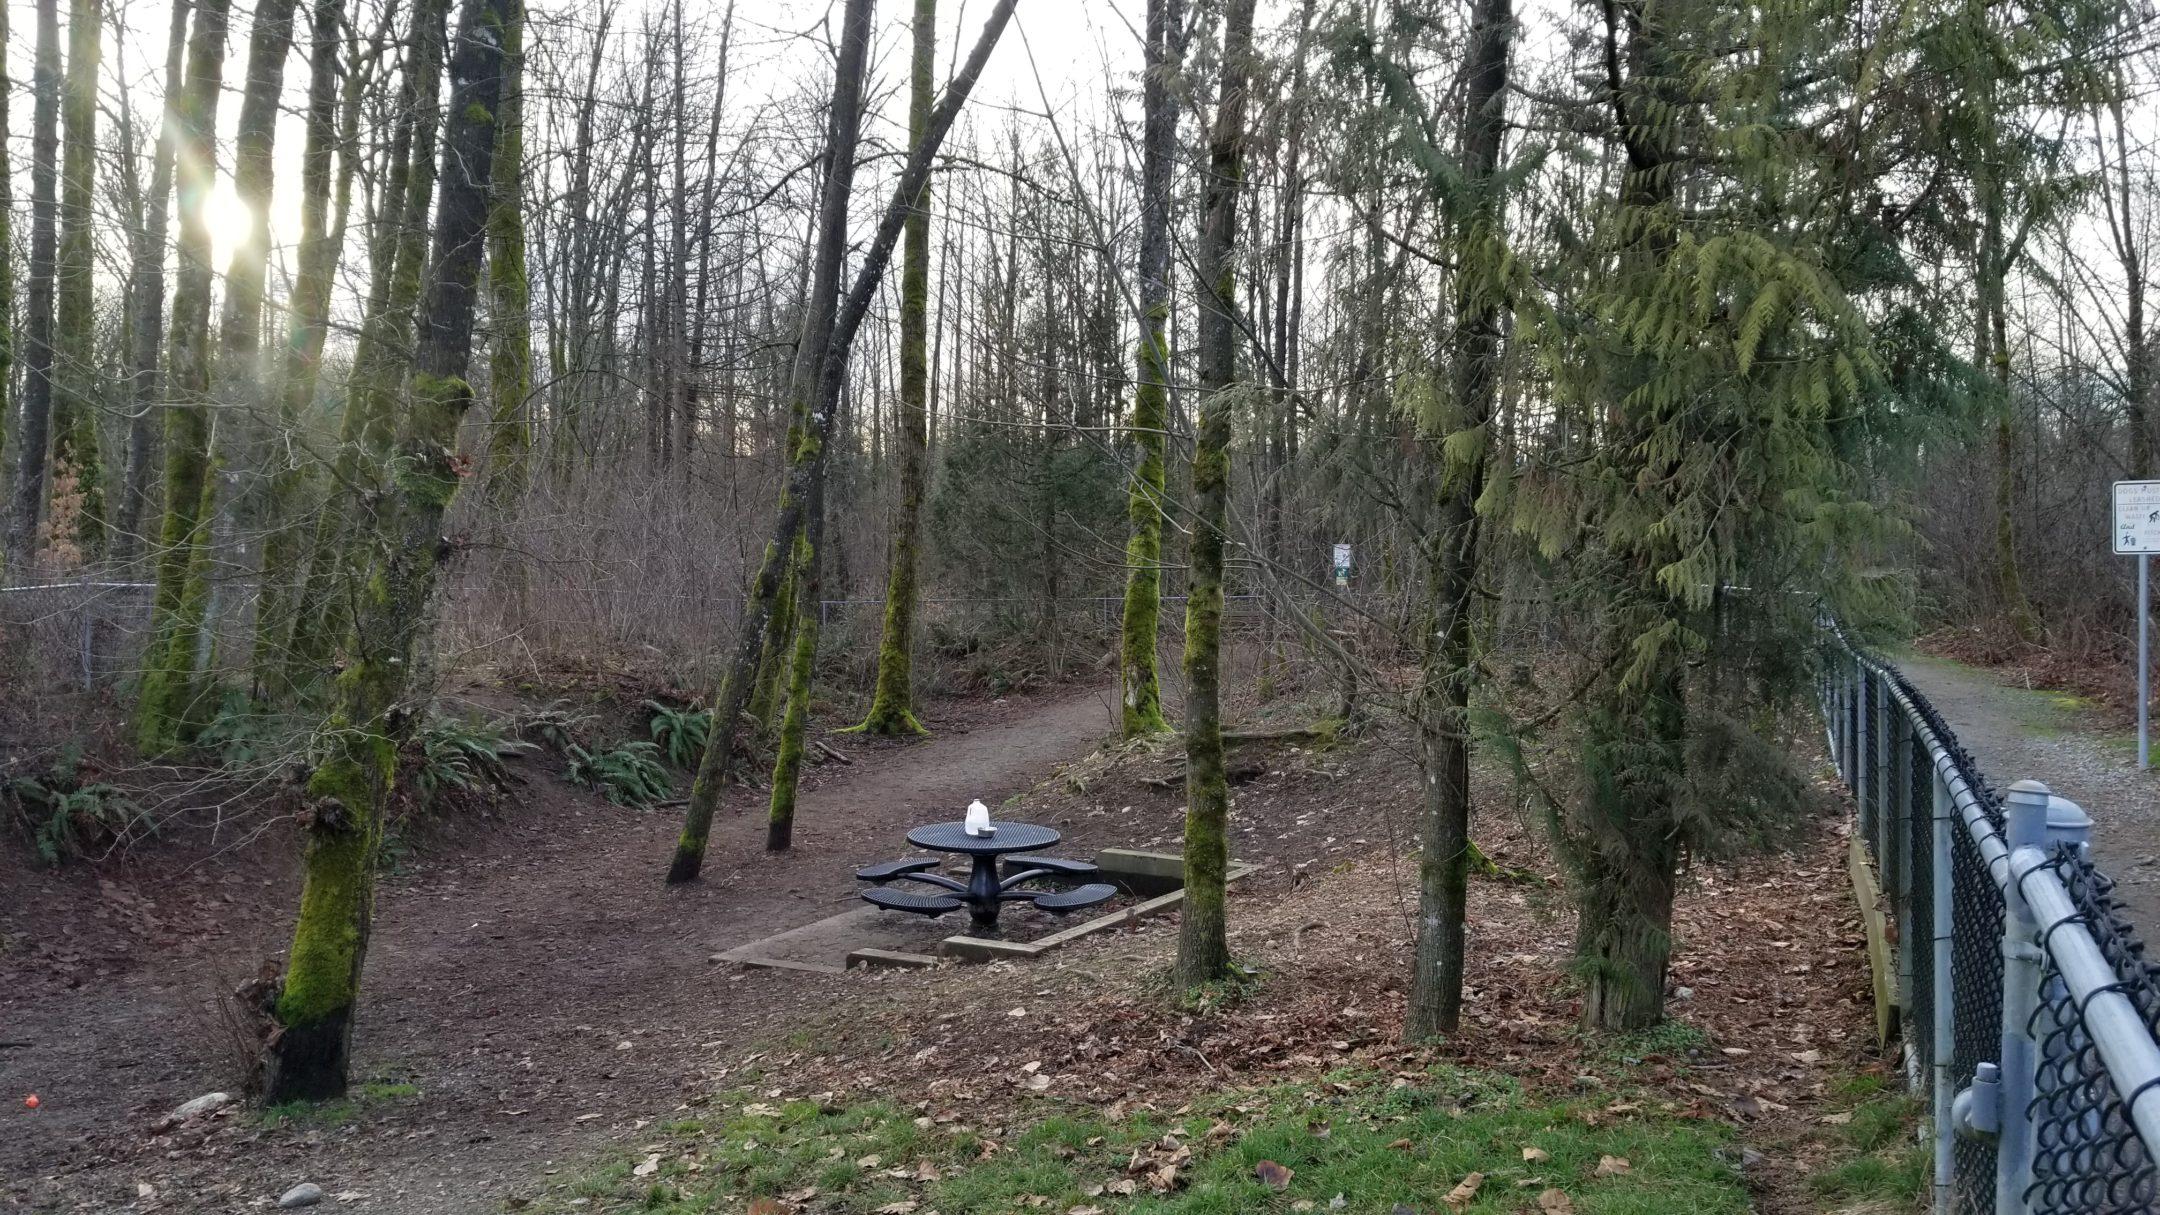 Shaughnessy Park Off-Leash Dog Park - Port Coquitlam - BC (3) - Small Dog Enclosure